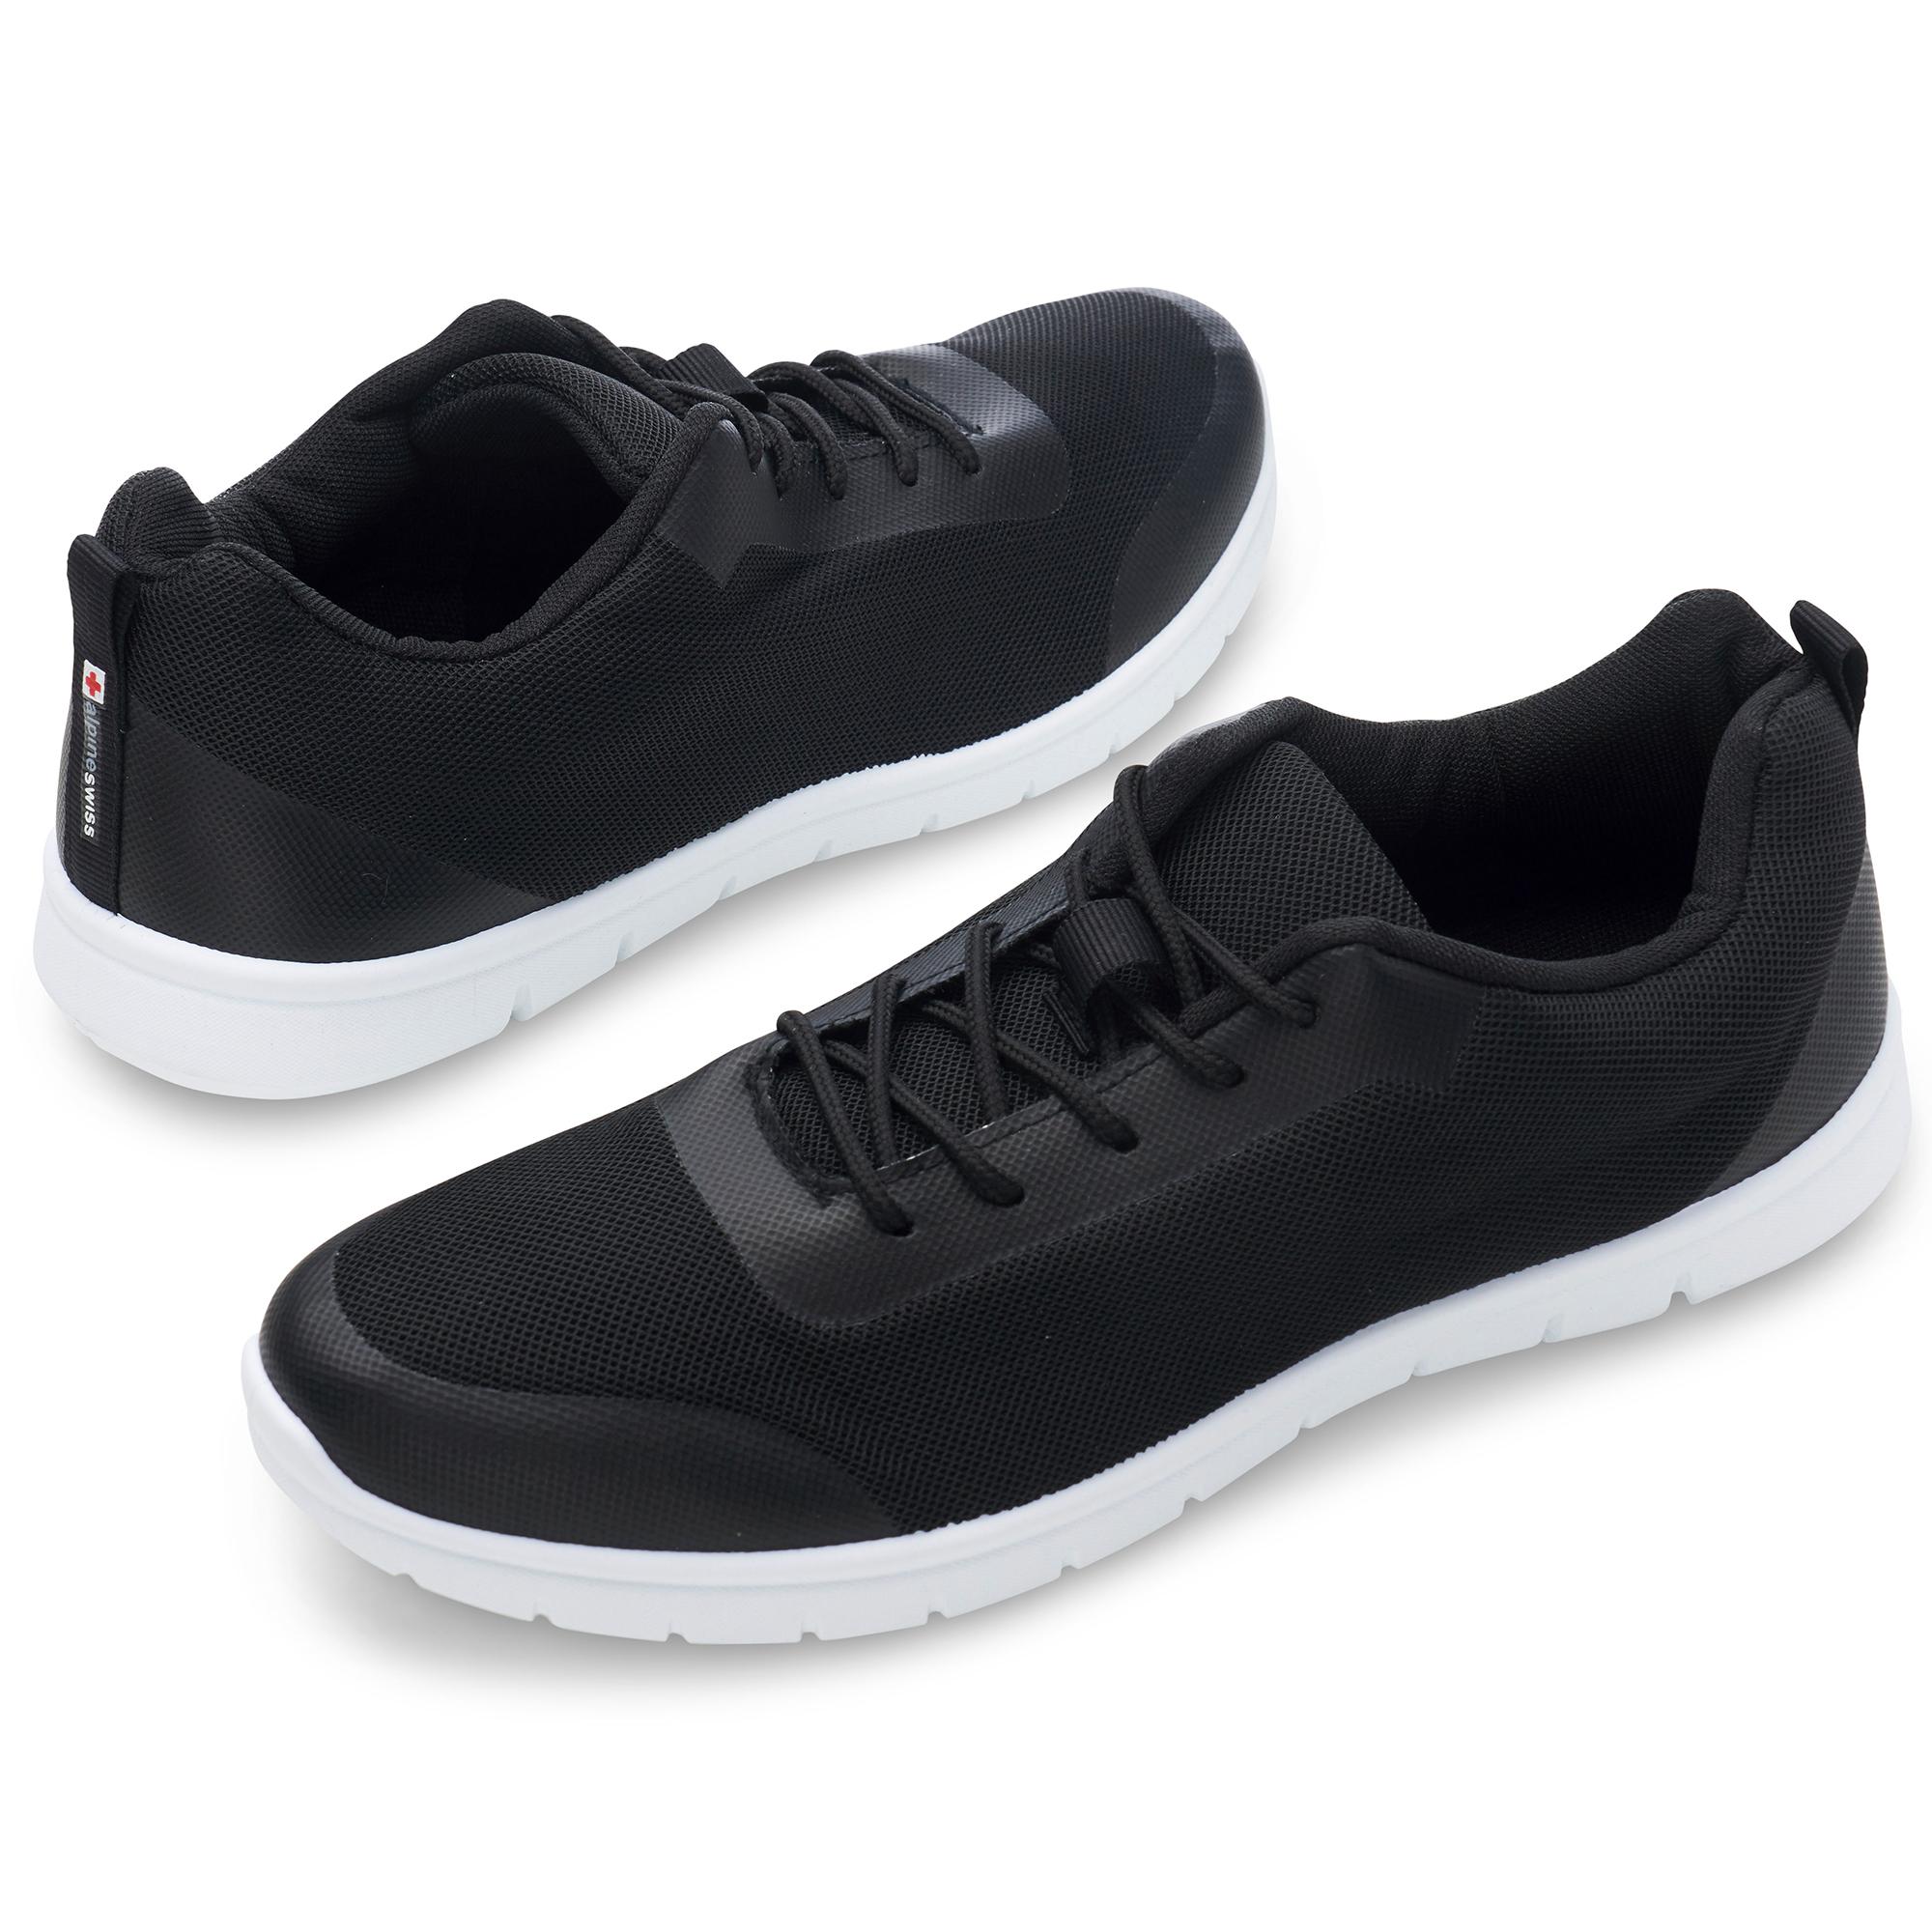 thumbnail 18 - Alpine Swiss Bolt Mesh Sneaker Casual Light Shoes For Men With Shoe Bag